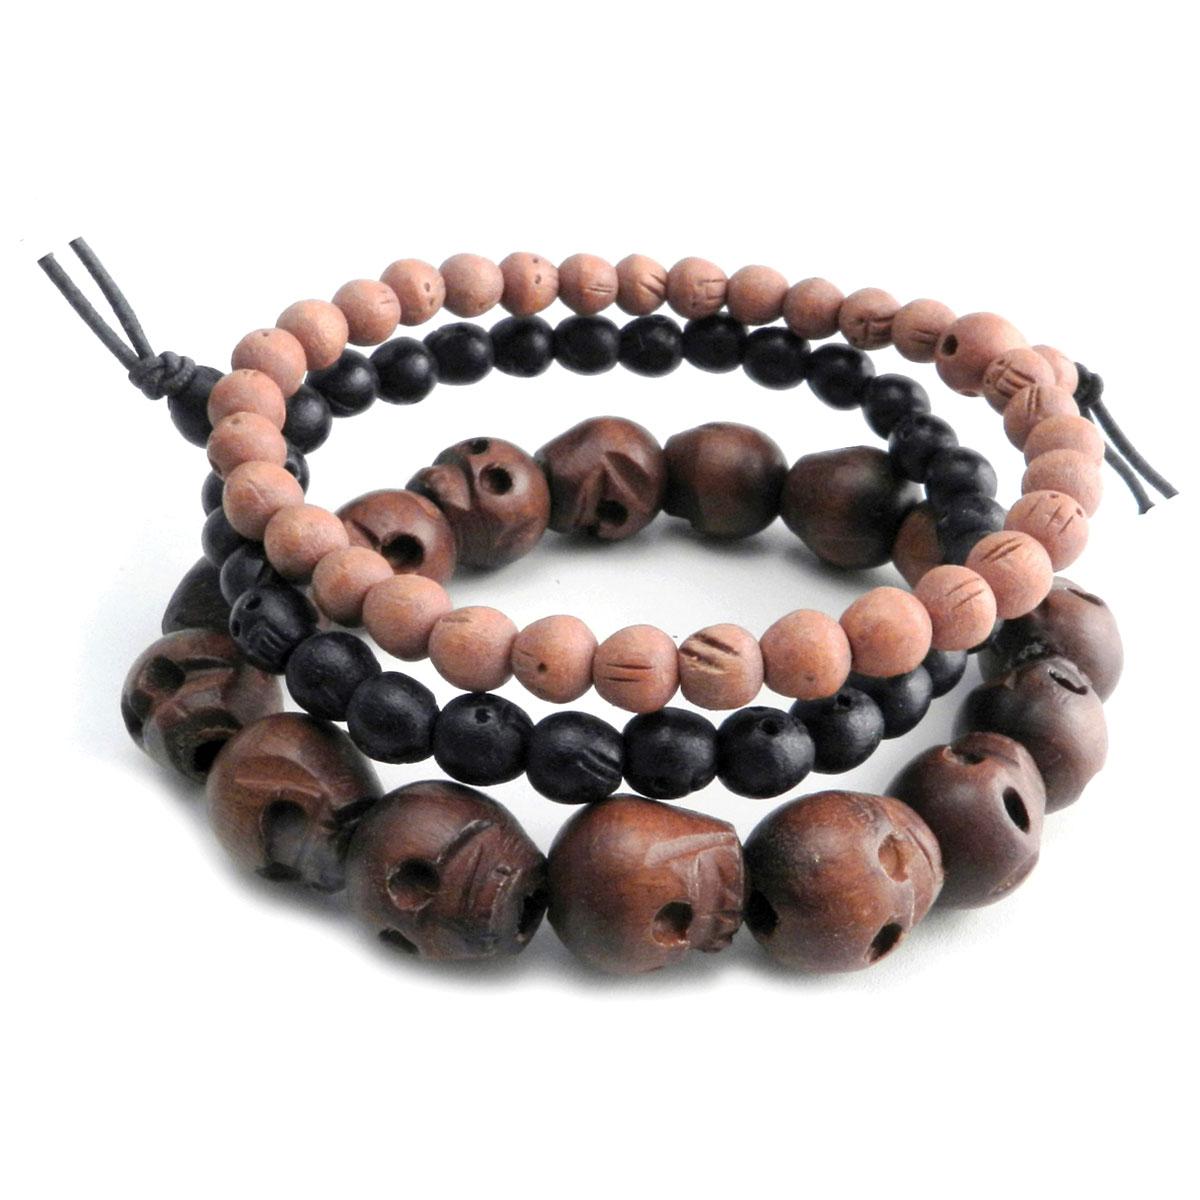 Amigaz Wood Skull Bead Bracelets P405